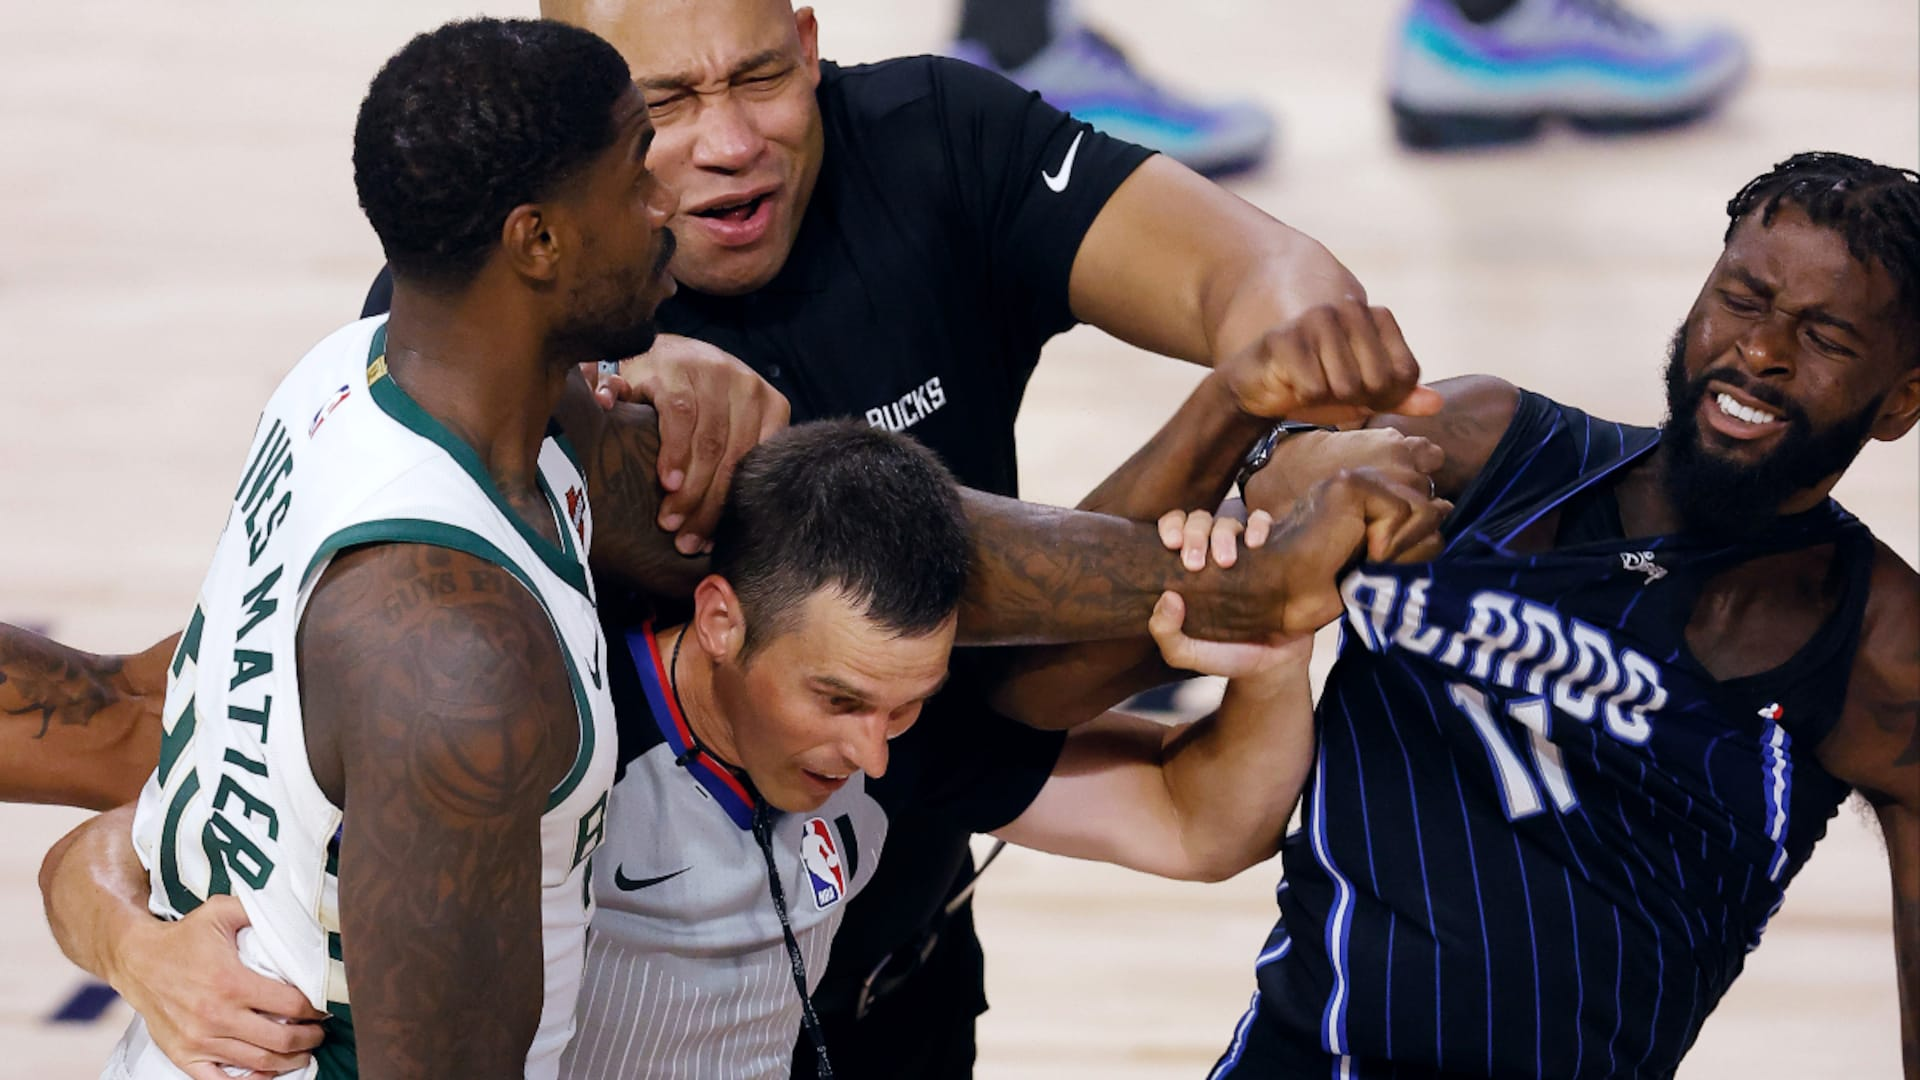 Bucks' Marvin Williams, Magic's James Ennis each fined $15K for altercation